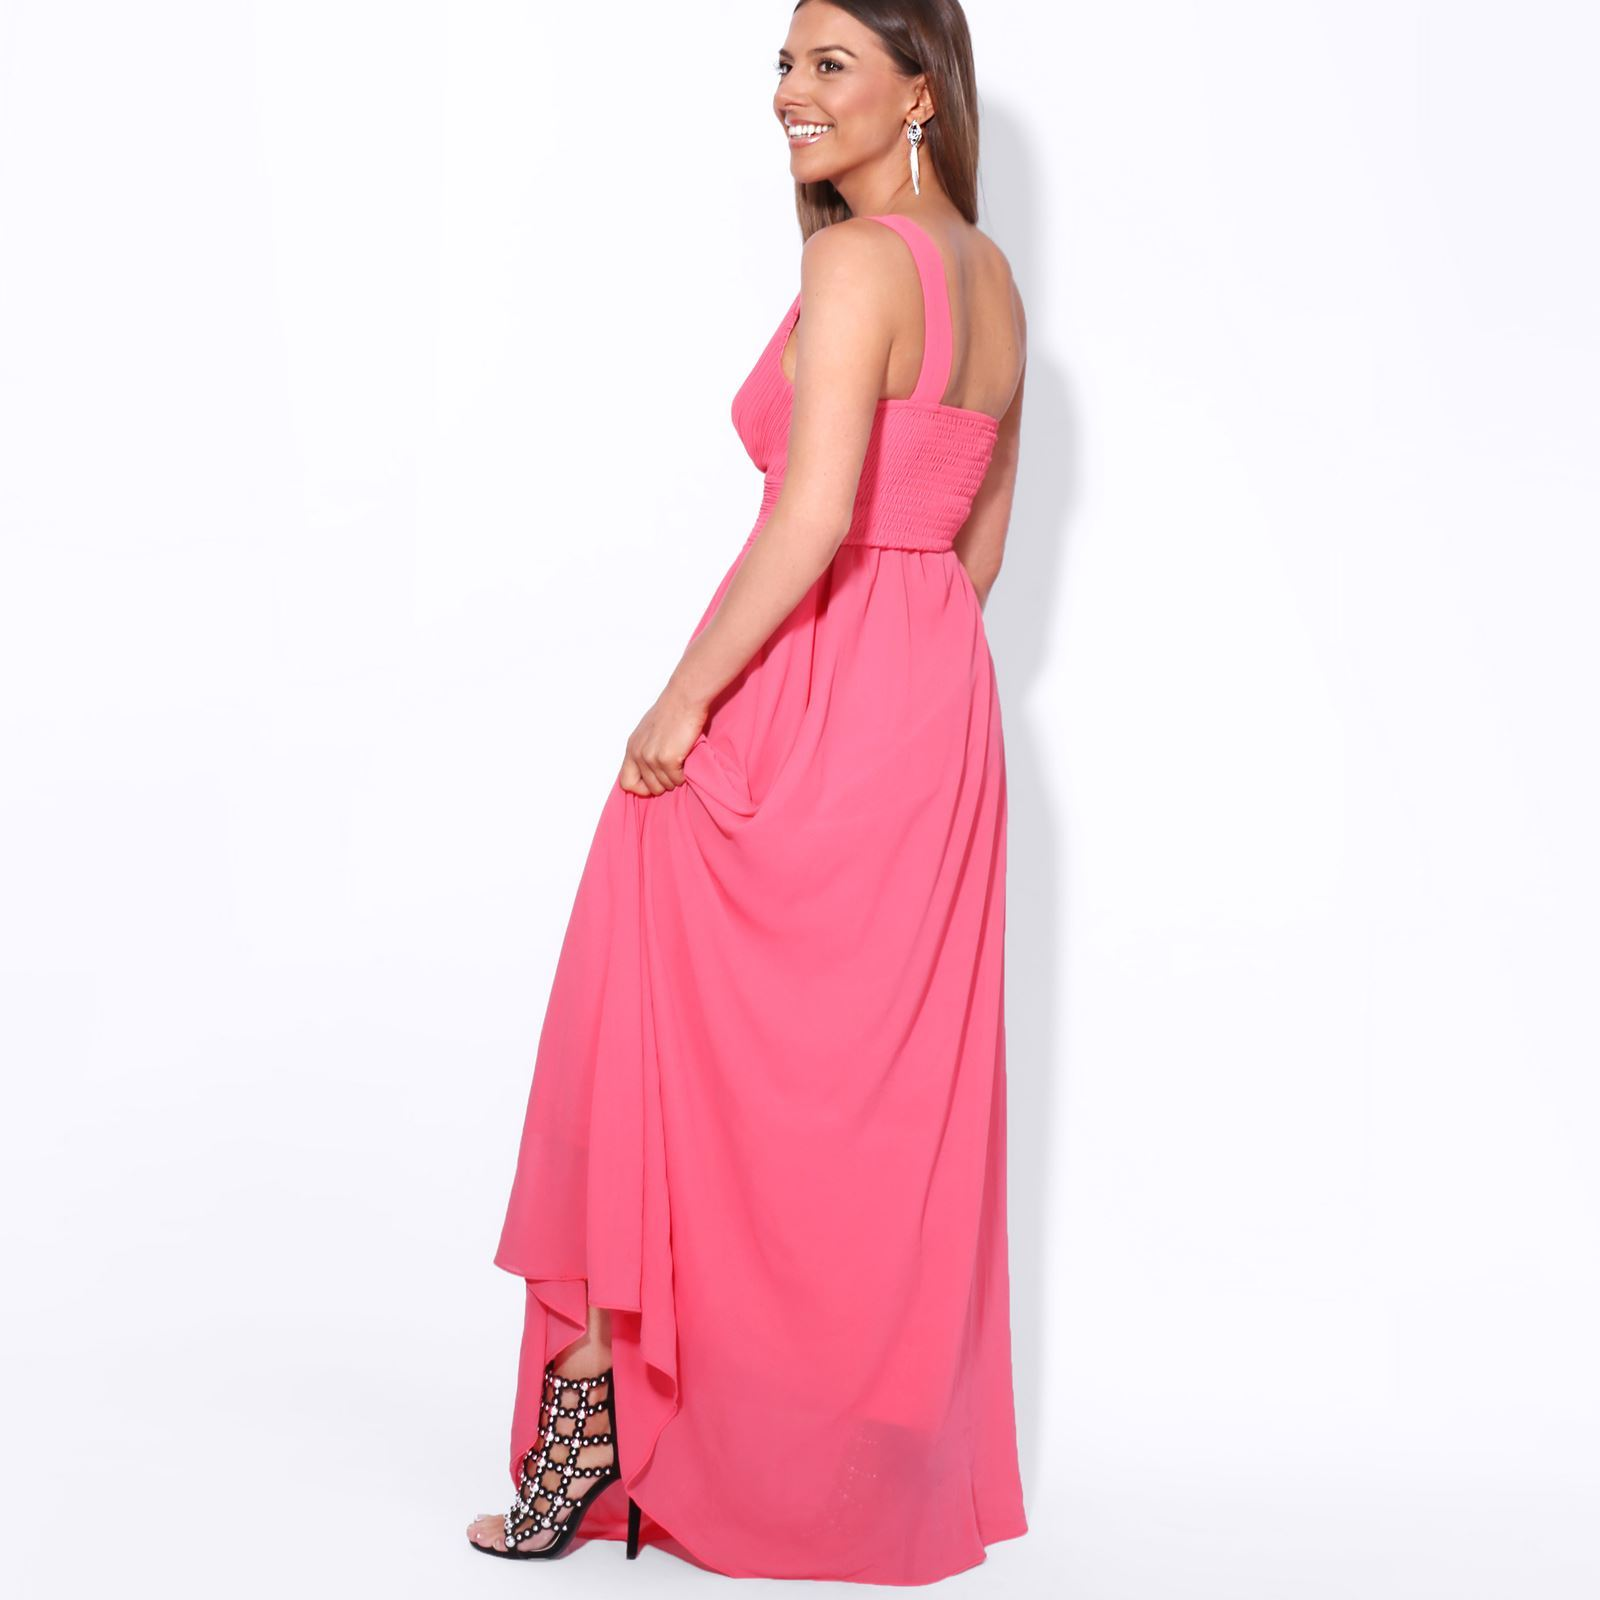 Womens-Wedding-Bridesmaid-Prom-Dress-Formal-One-Off-Shoulder-Long-Evening-8-18 thumbnail 15